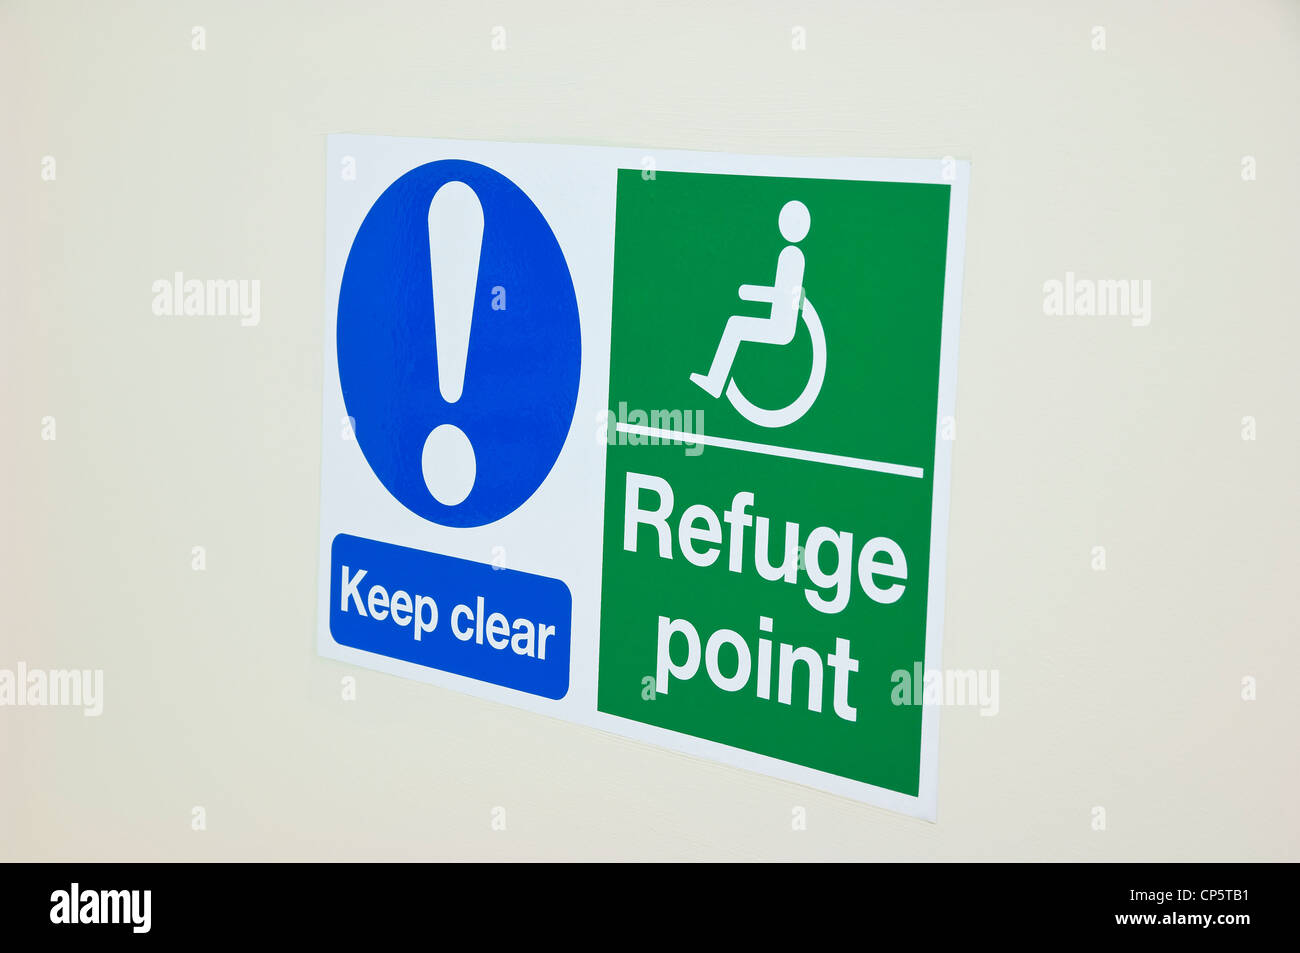 Disability Imágenes De Stock & Disability Fotos De Stock